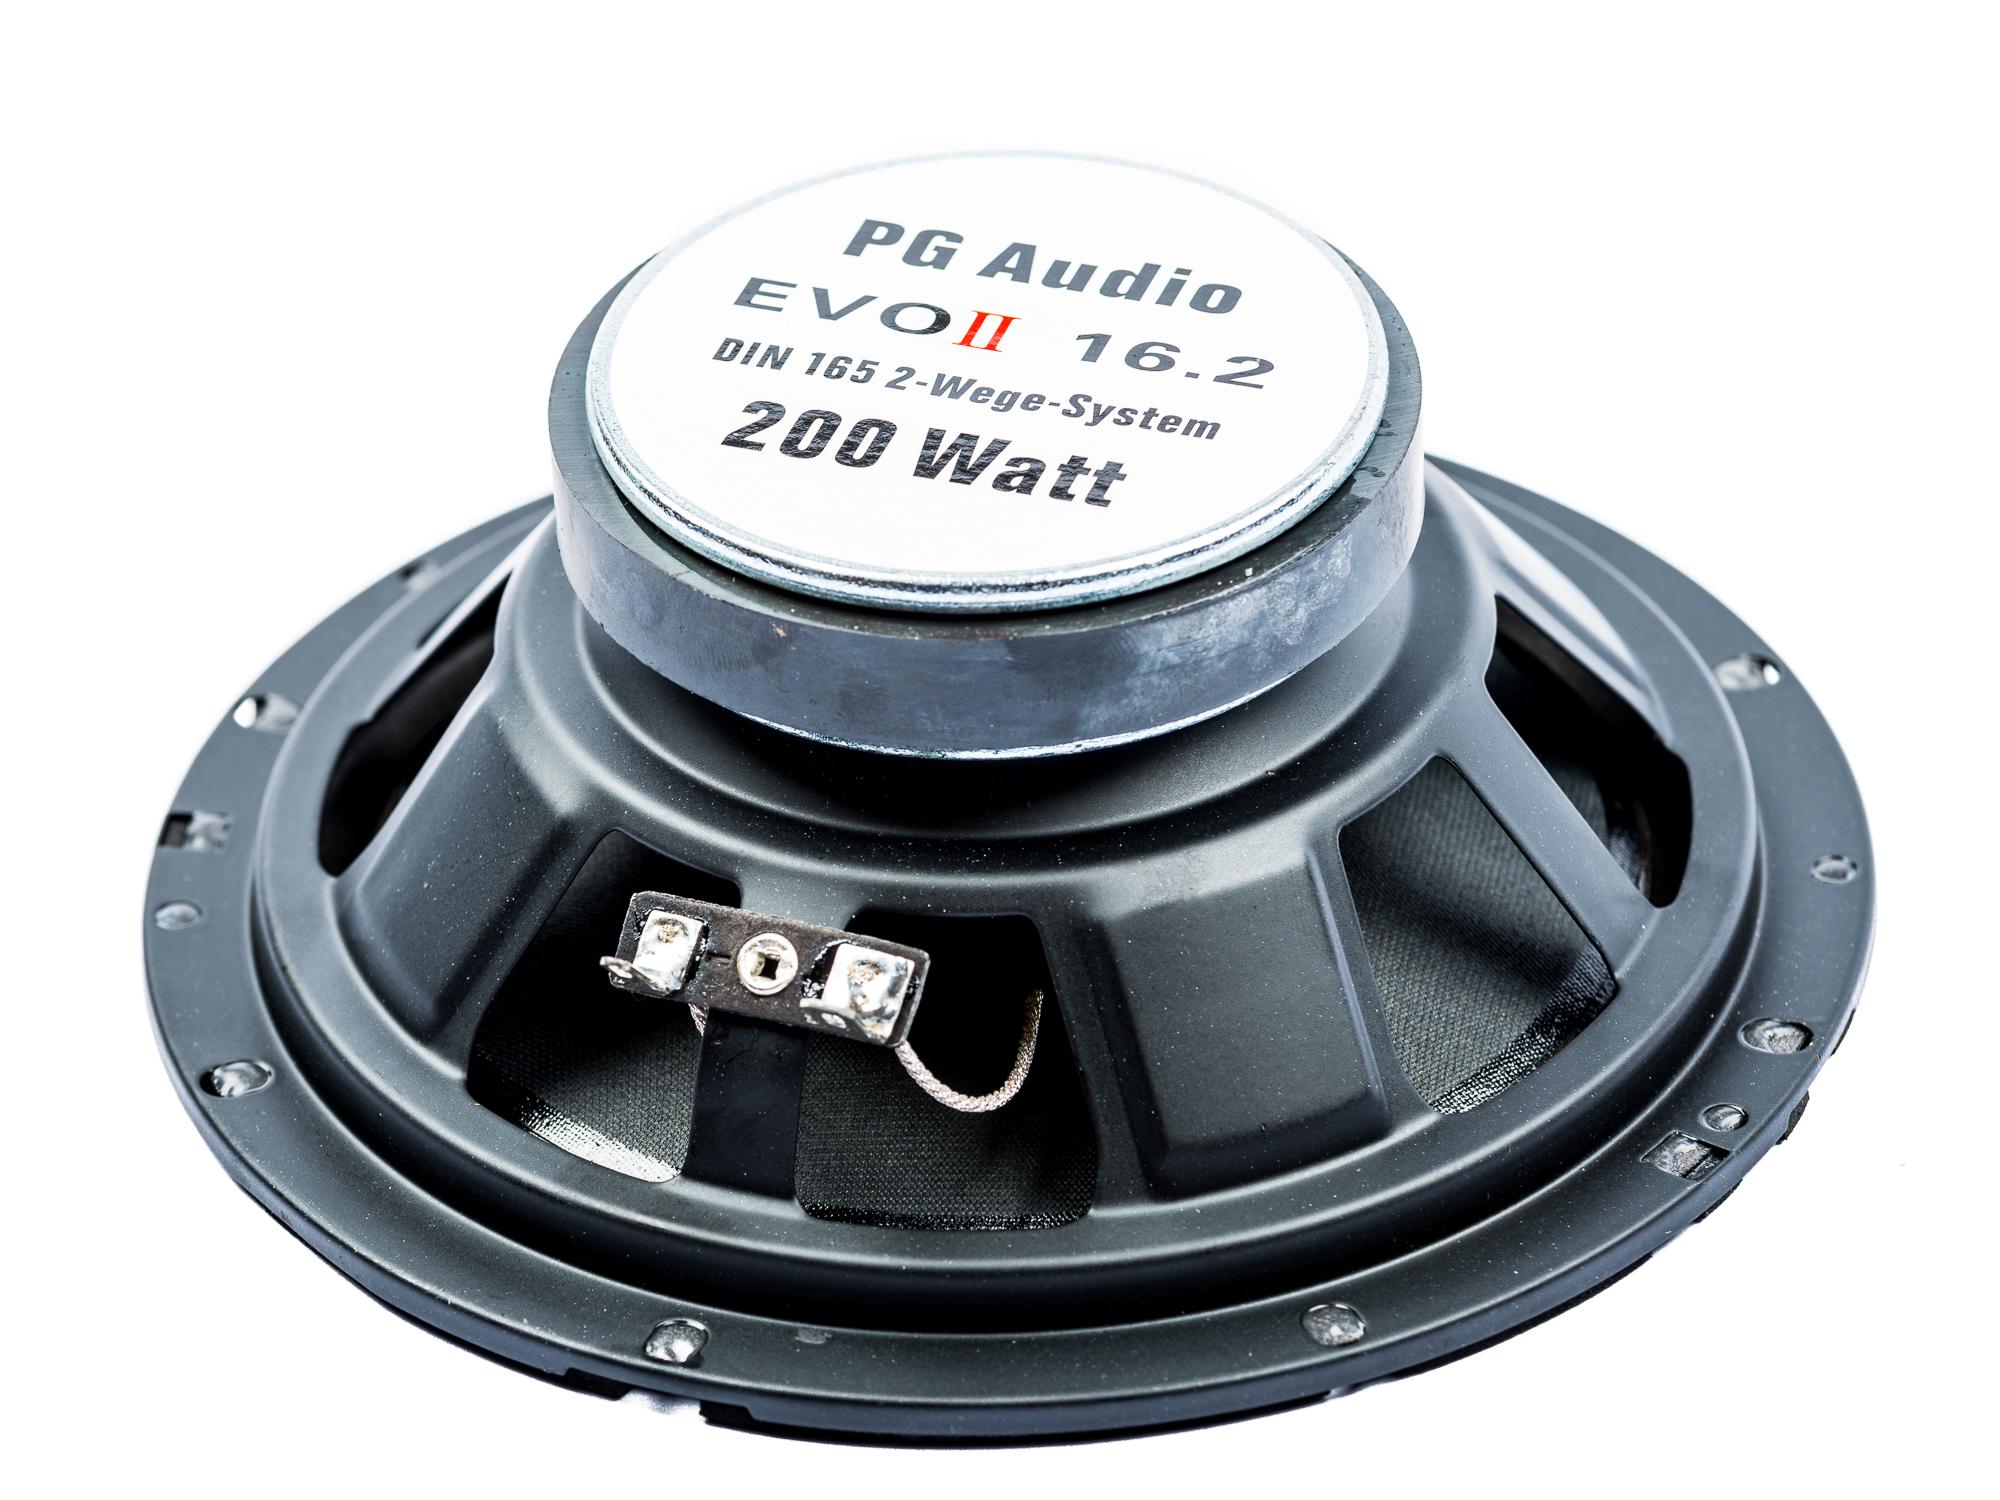 Citroen Jumpy Peugeot Expert Lautsprecher Einbauset Tür vorne PG Audio – Bild 3